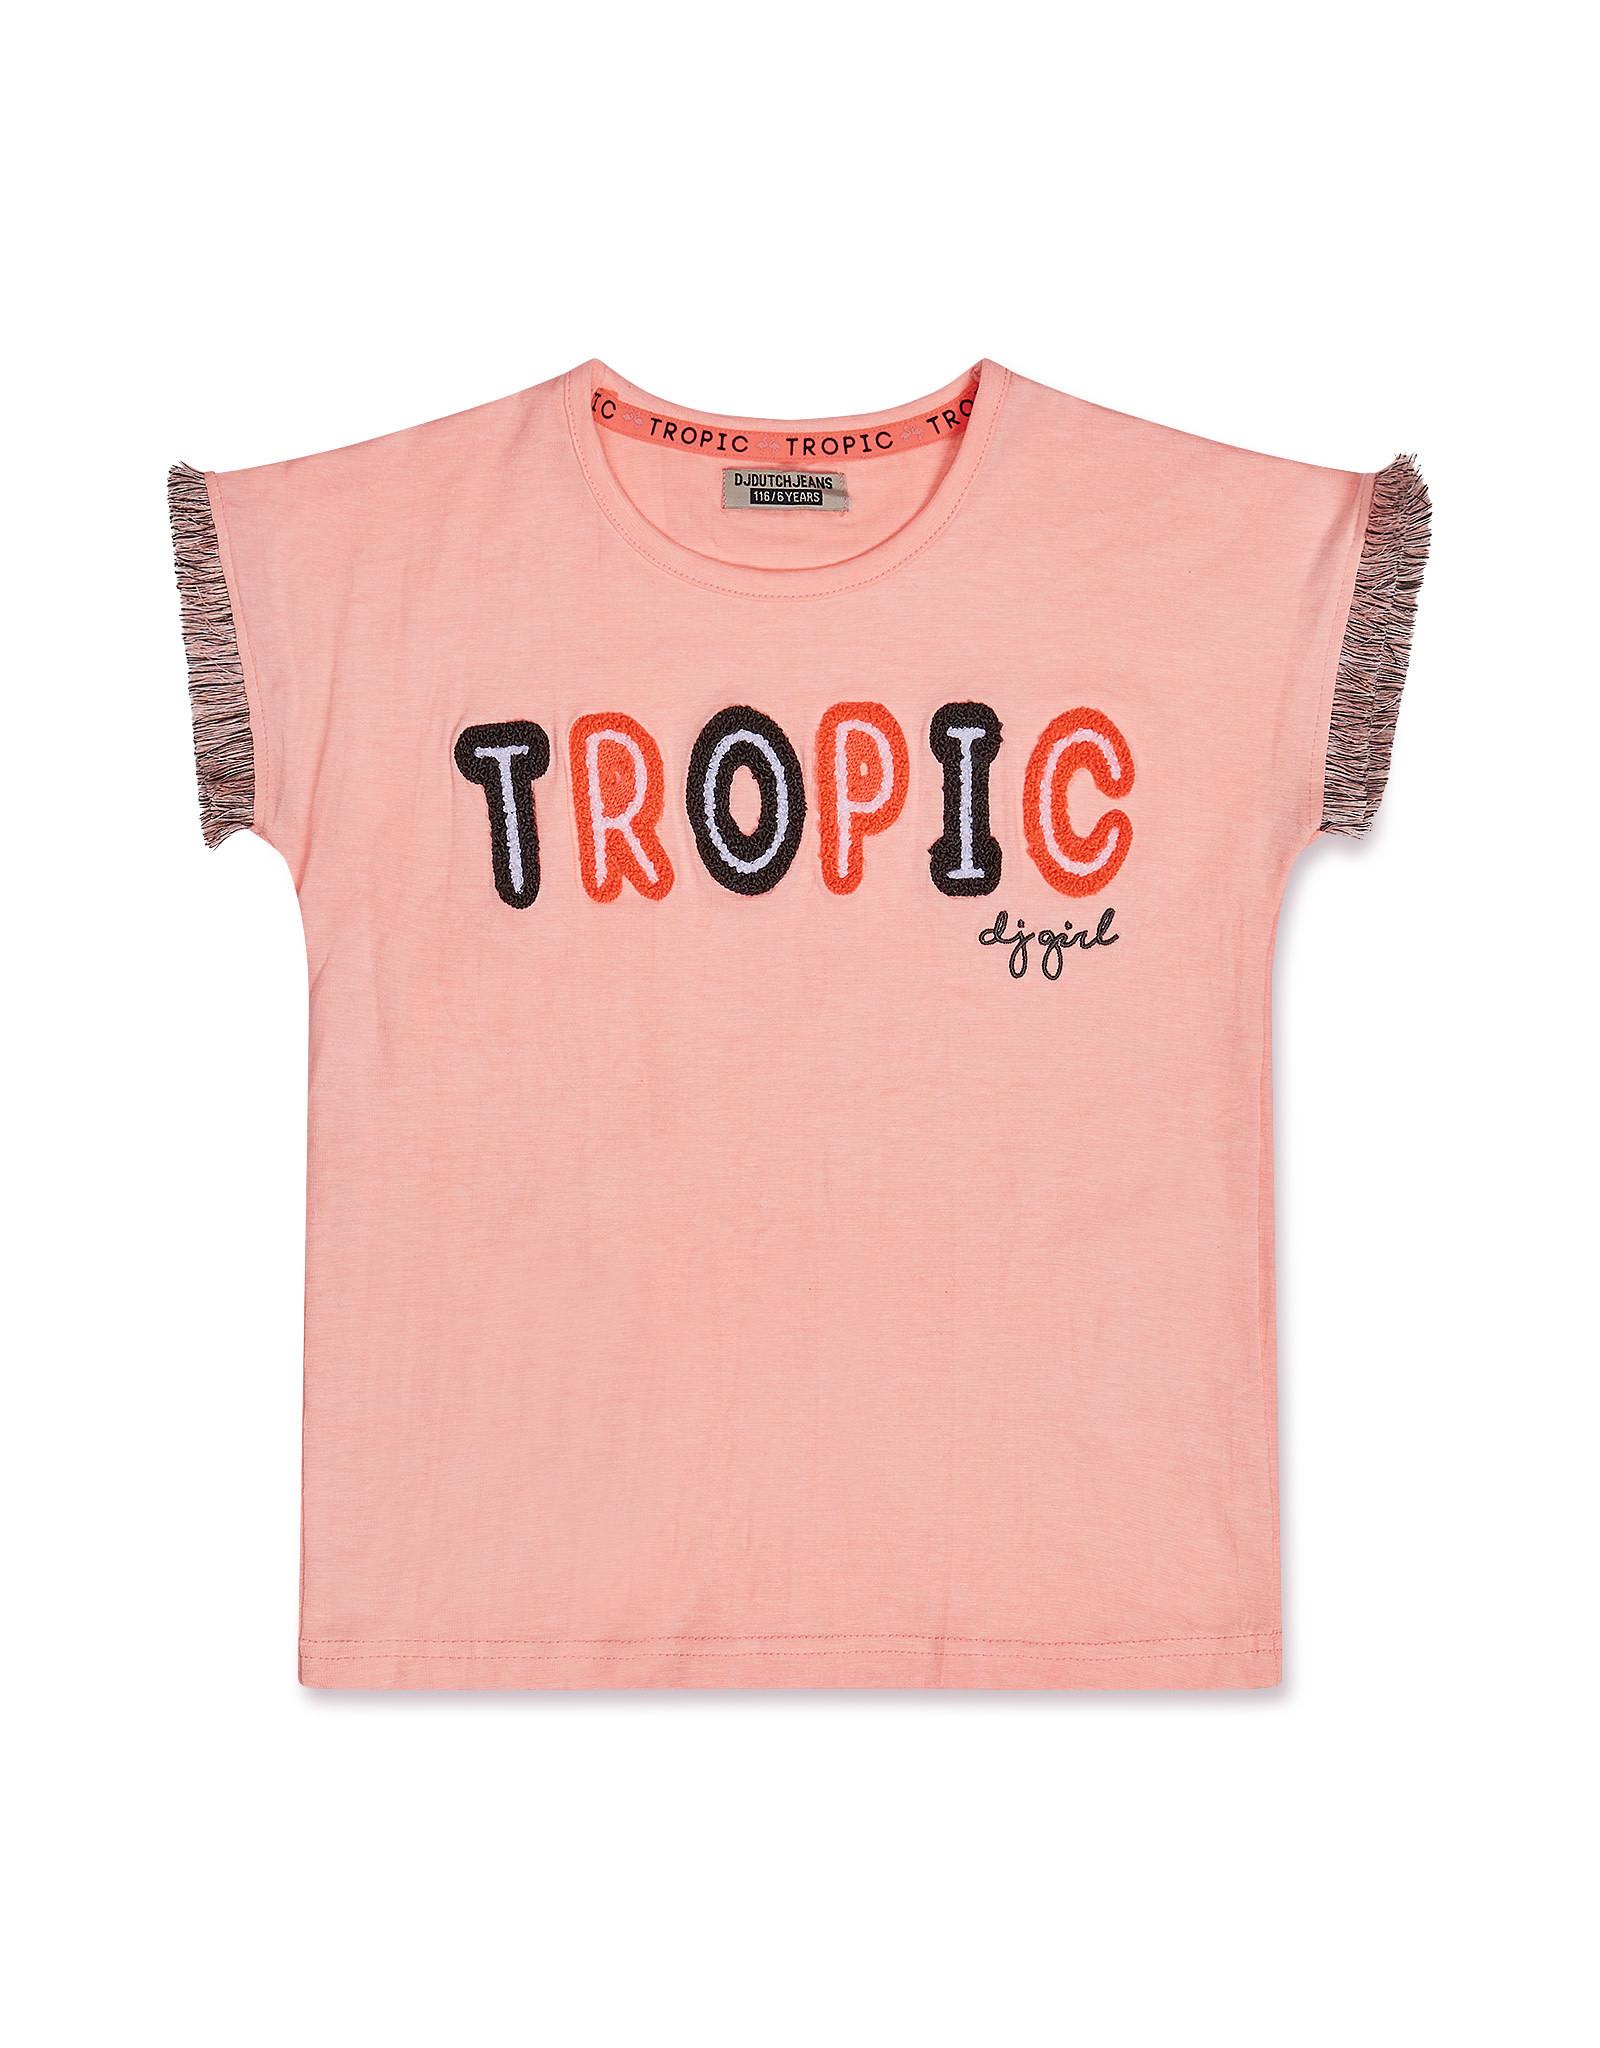 DJ Dutchjeans DJ Dutchjeans meisjes t-shirt Tropic Light Neon Coral